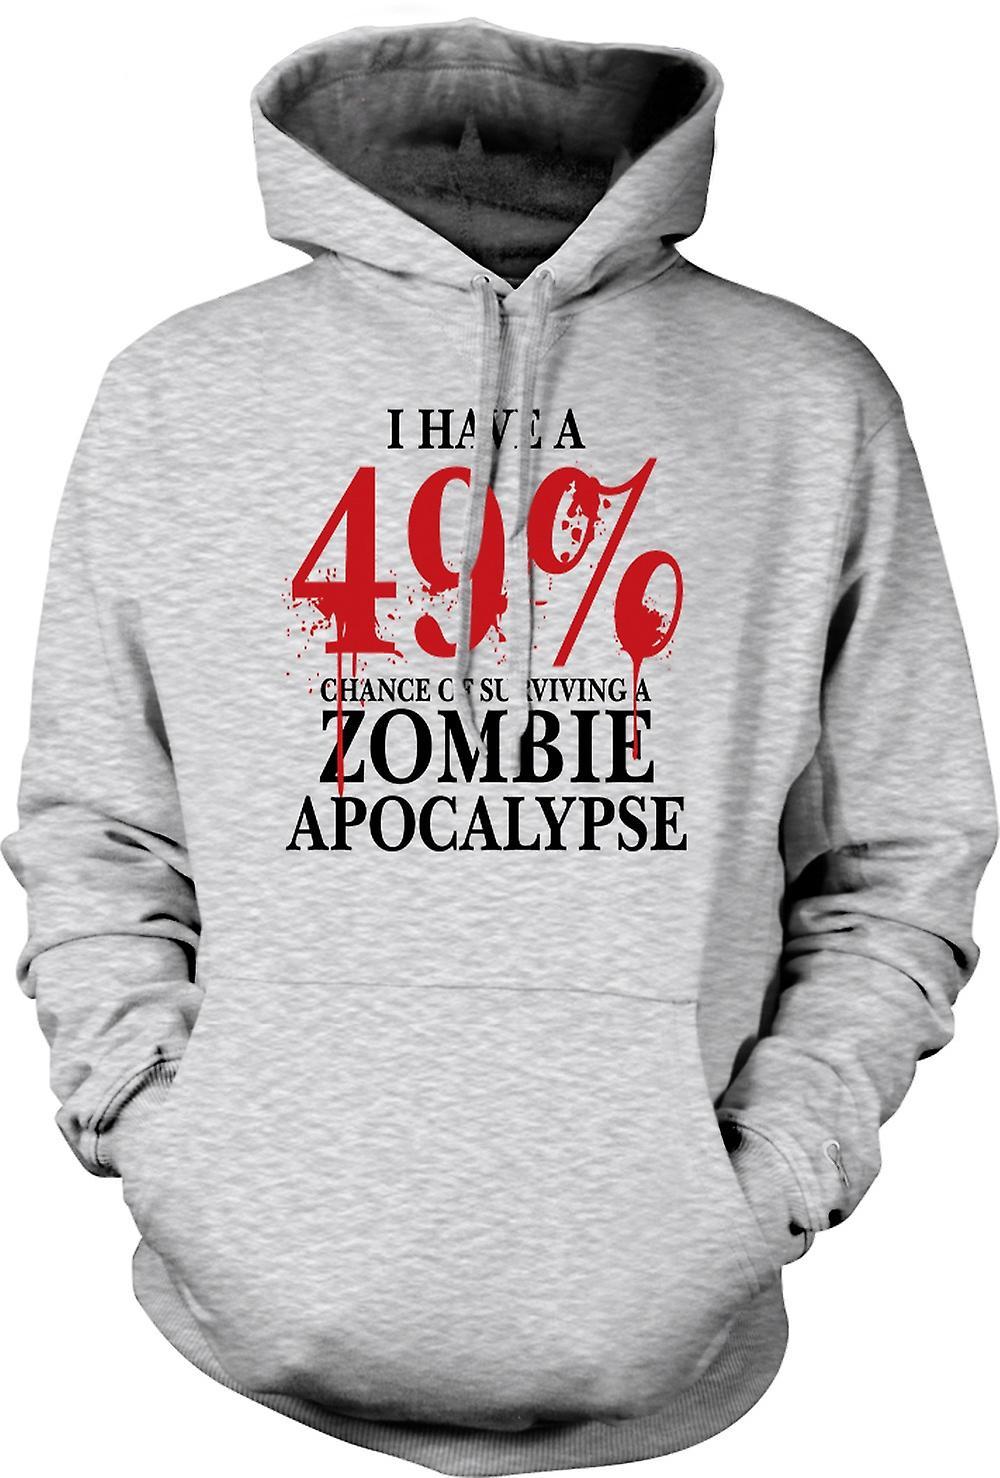 Mens Hoodie - Zombie Apocalypse 49% - Horreur drôle